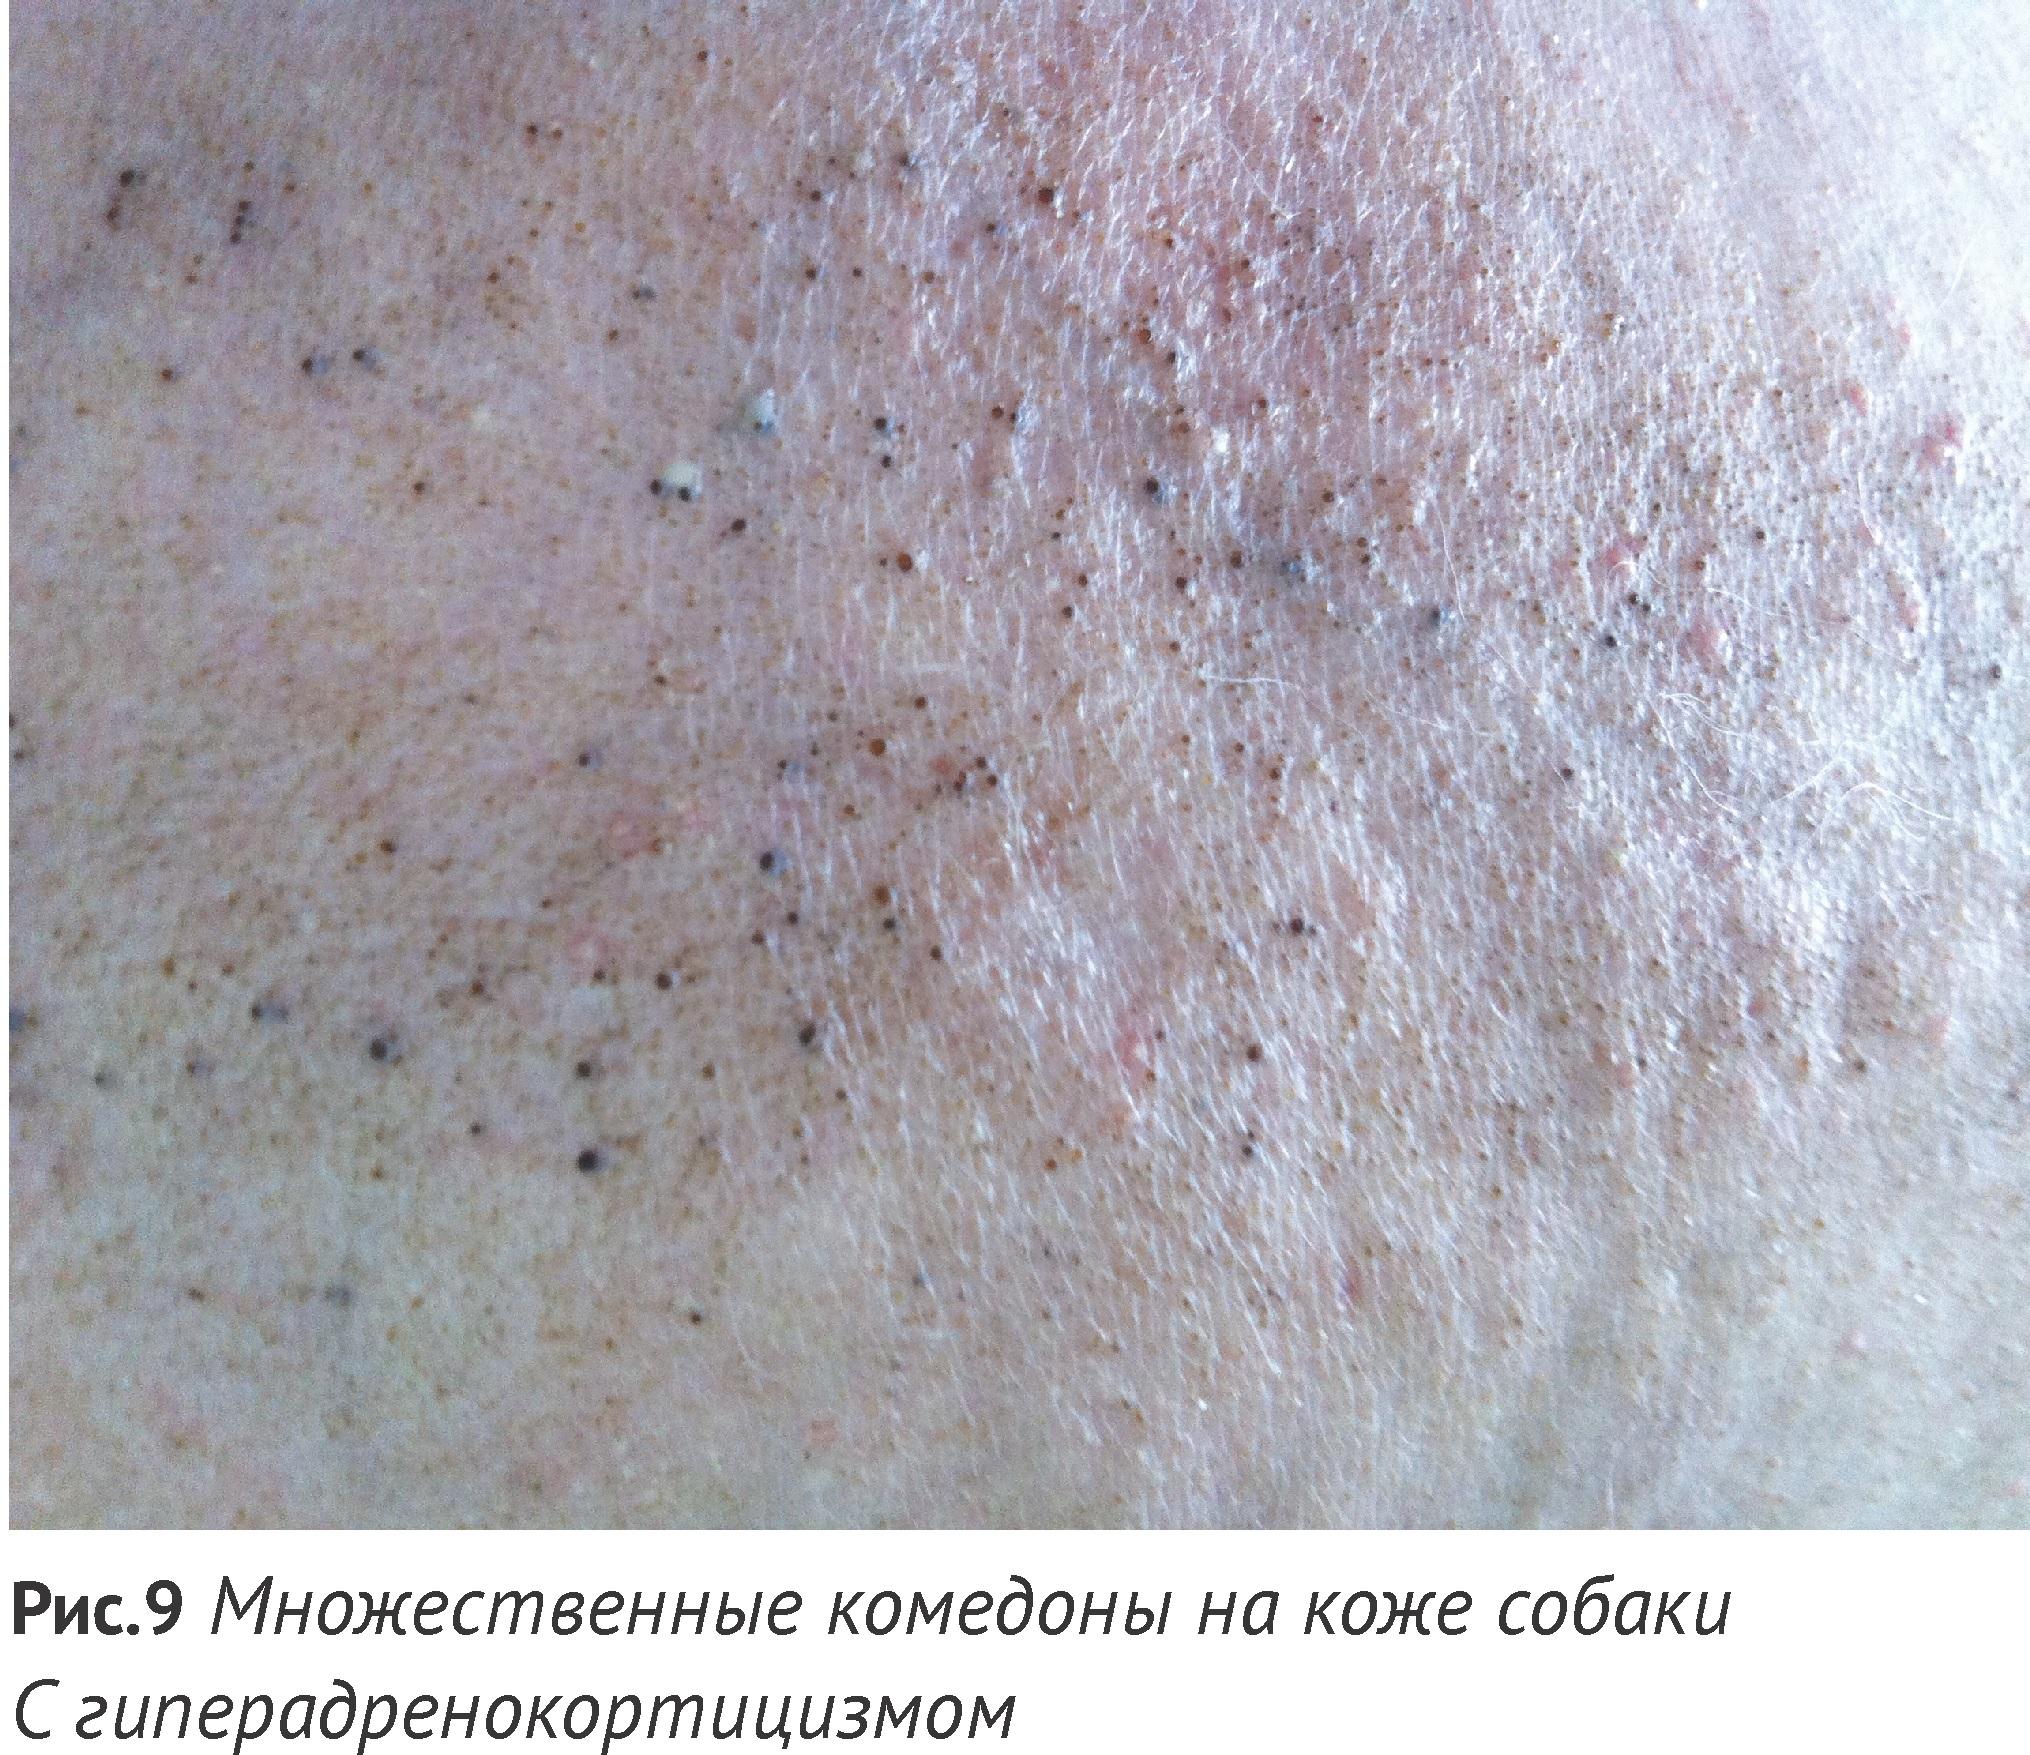 гиперкератоз кожи фото у собак